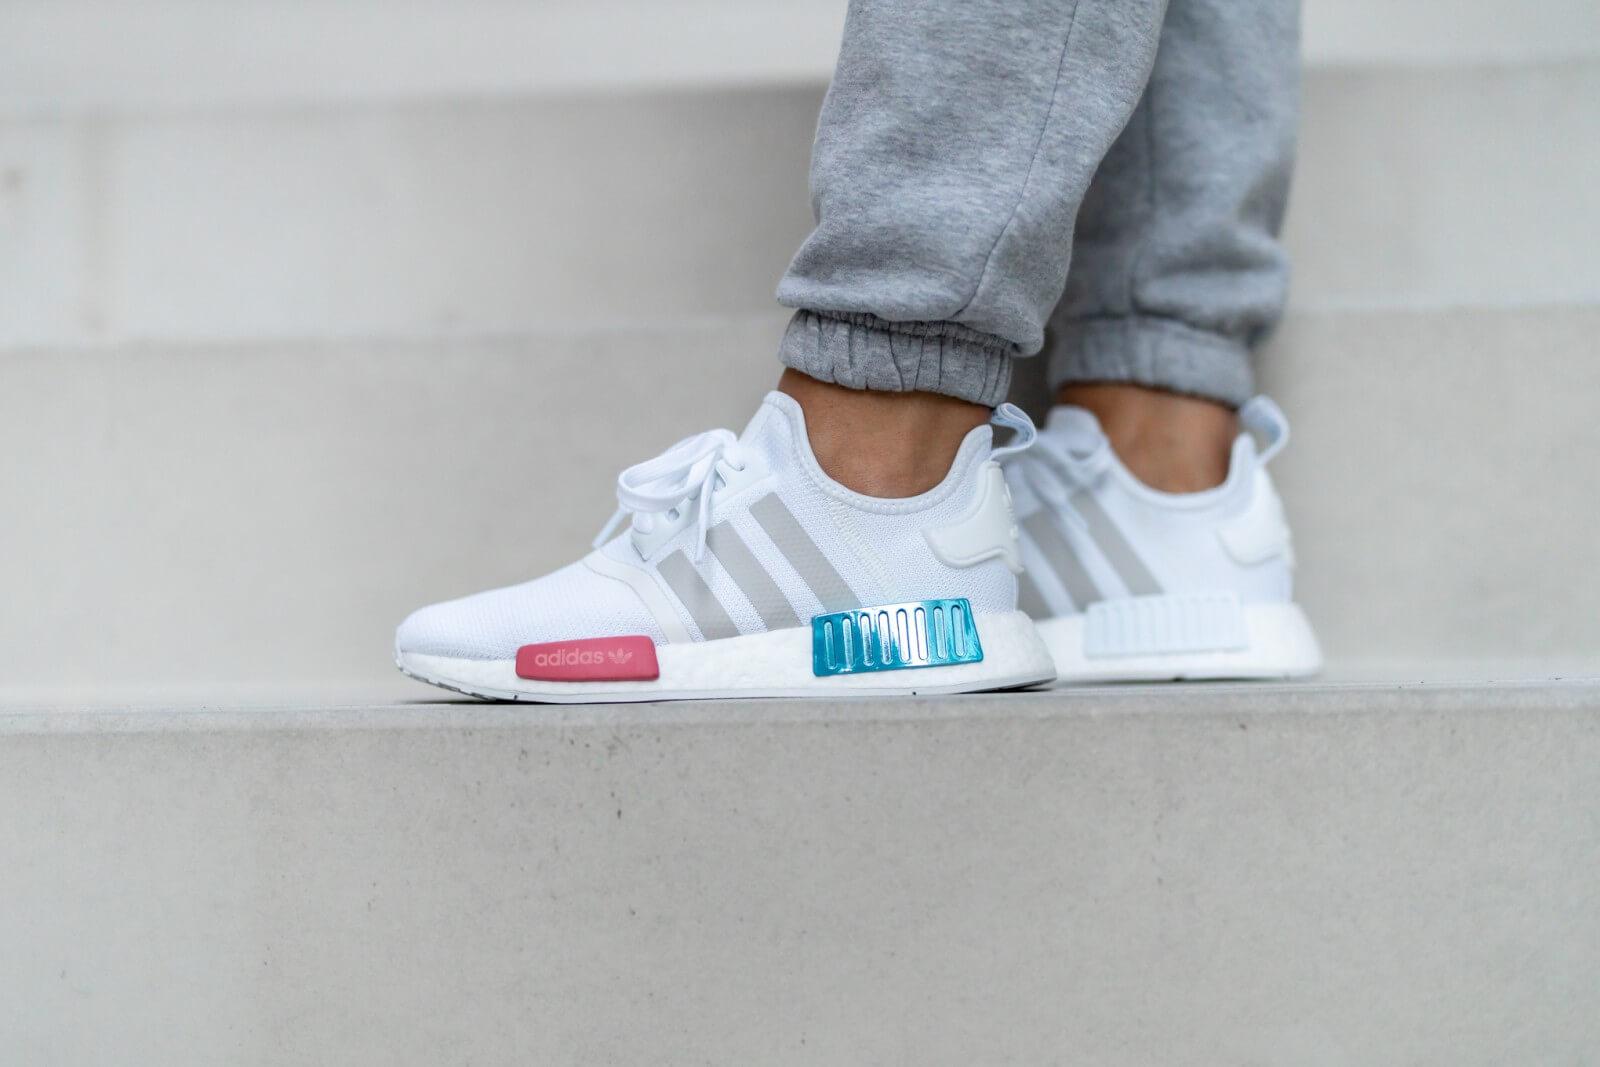 Adidas Women's NMD R1 Cloud White/Grey One-Hazy Rose